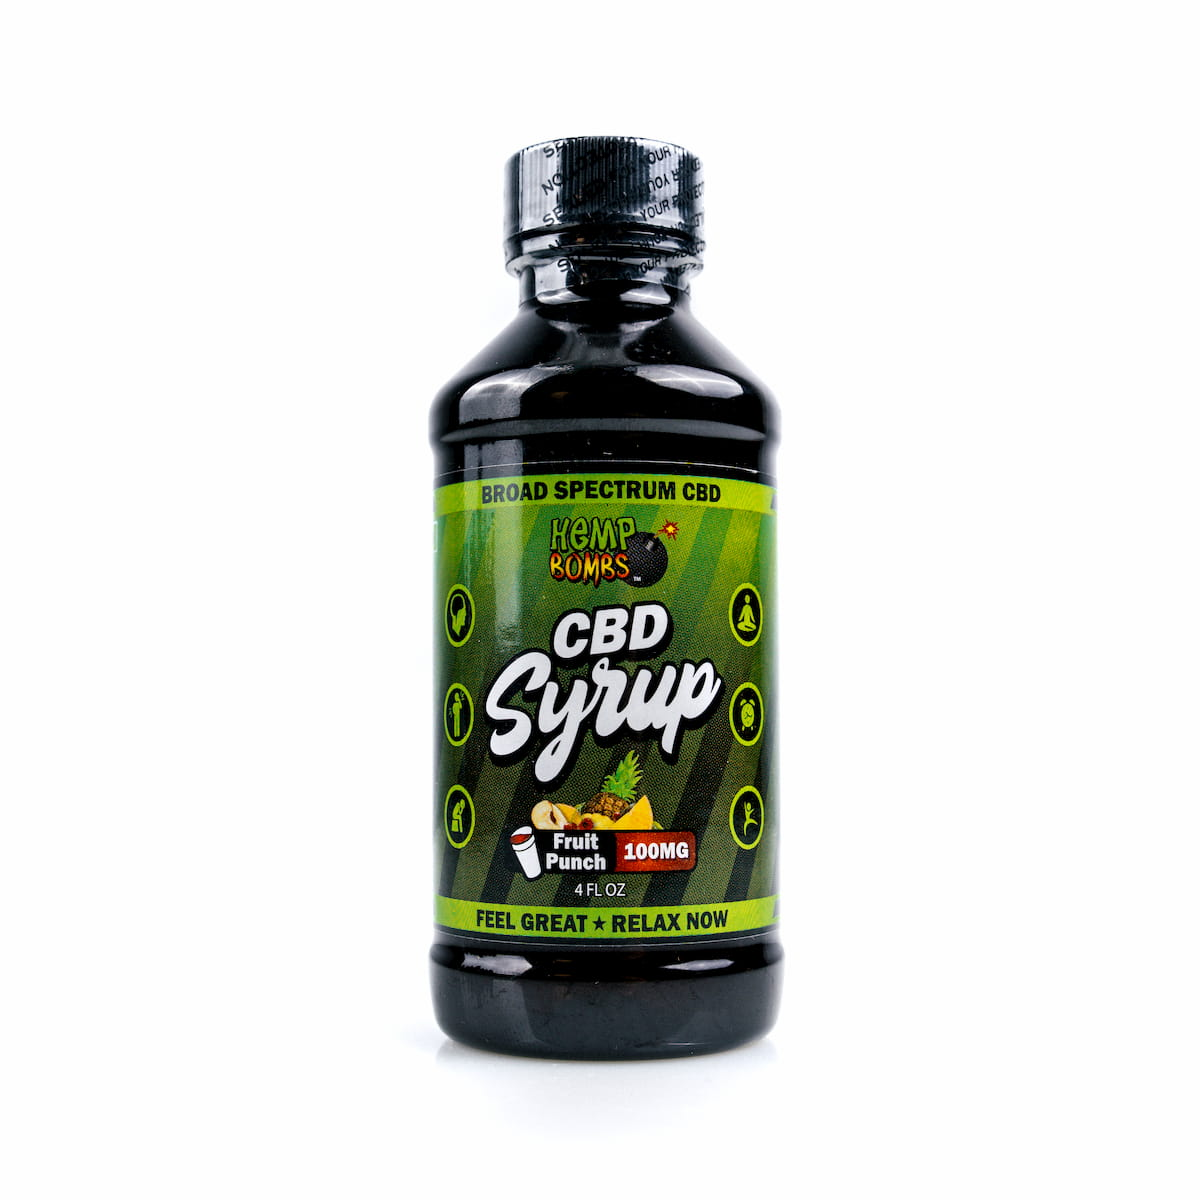 Hemp Bombs, CBD Relaxation Syrup, 4oz, 100mg of CBD